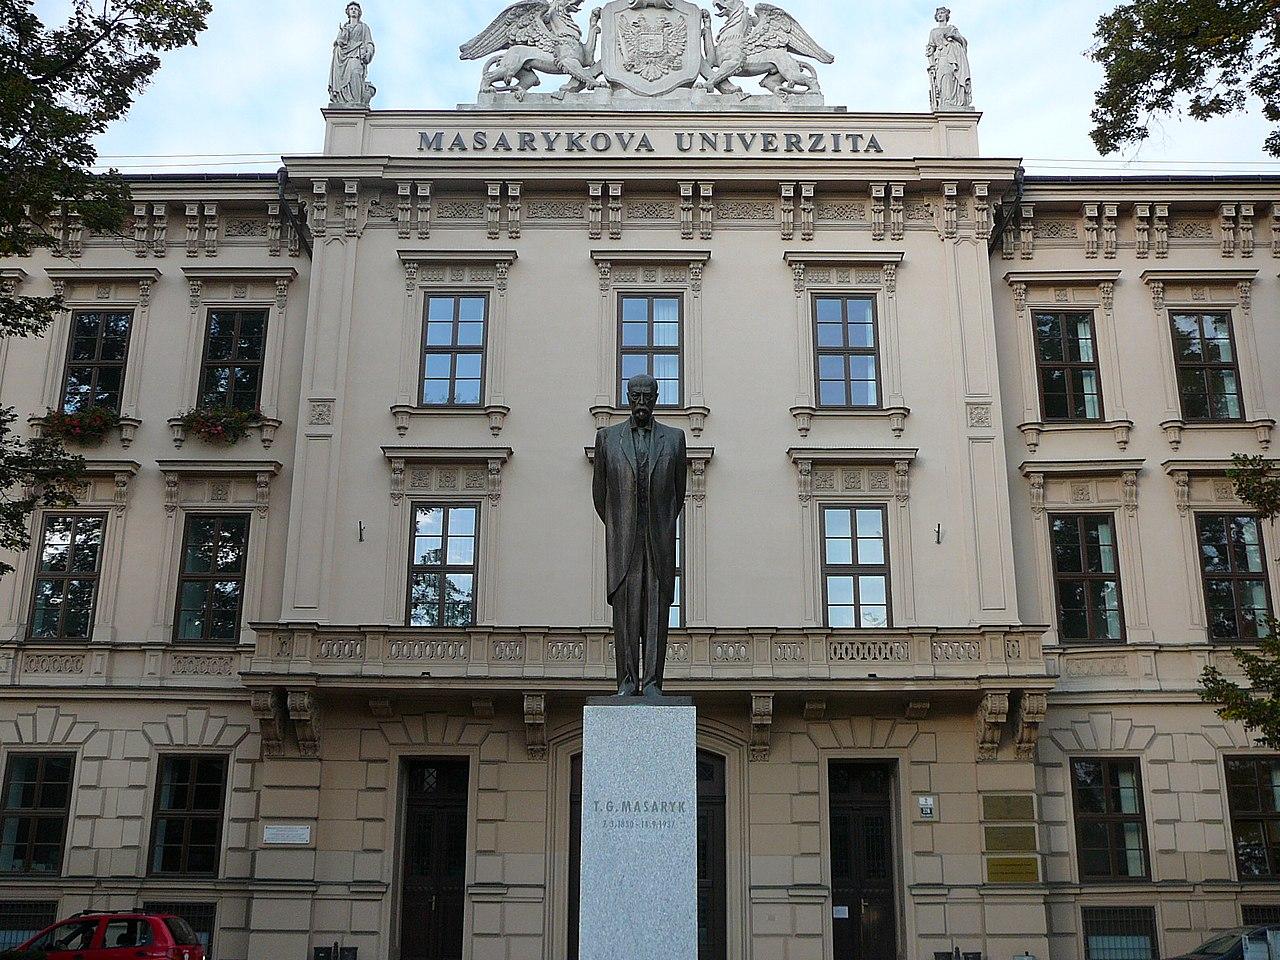 Masarykova univerzita. Zdroj: Wikimedia Commons